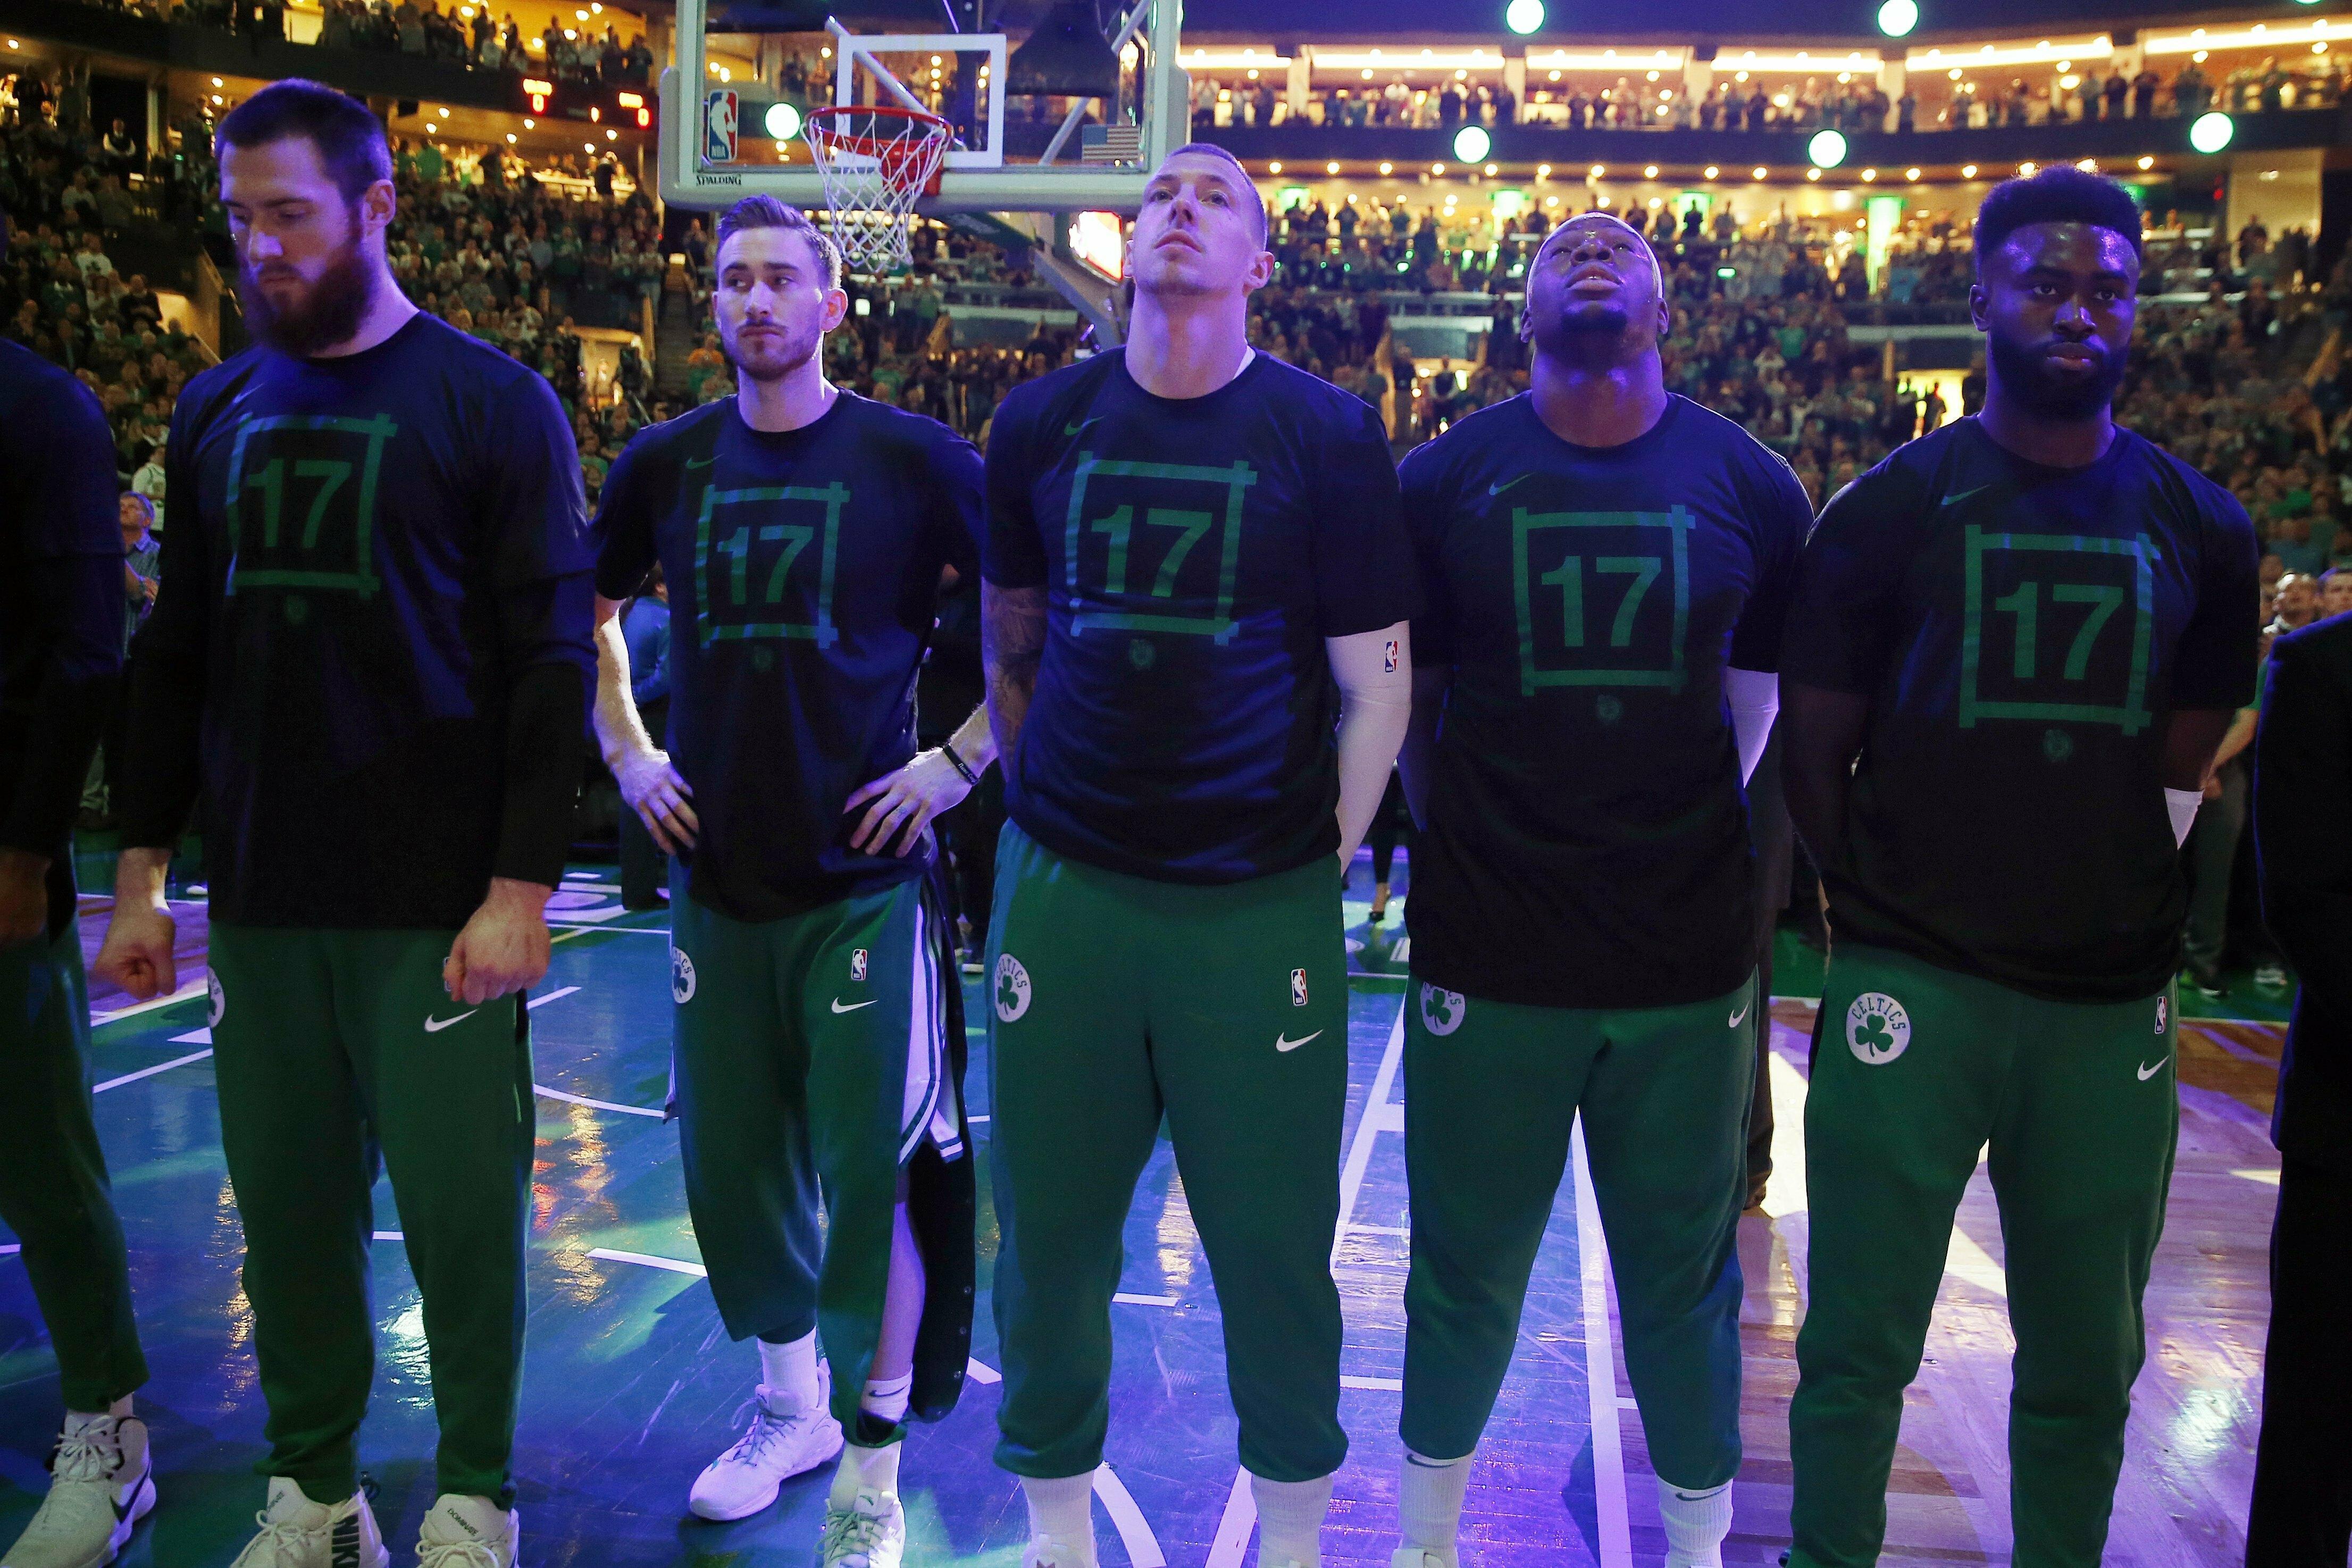 e78b5f2fc19 Boston Celtics wear the No. 17 during a moment of silence for former Celtic  John